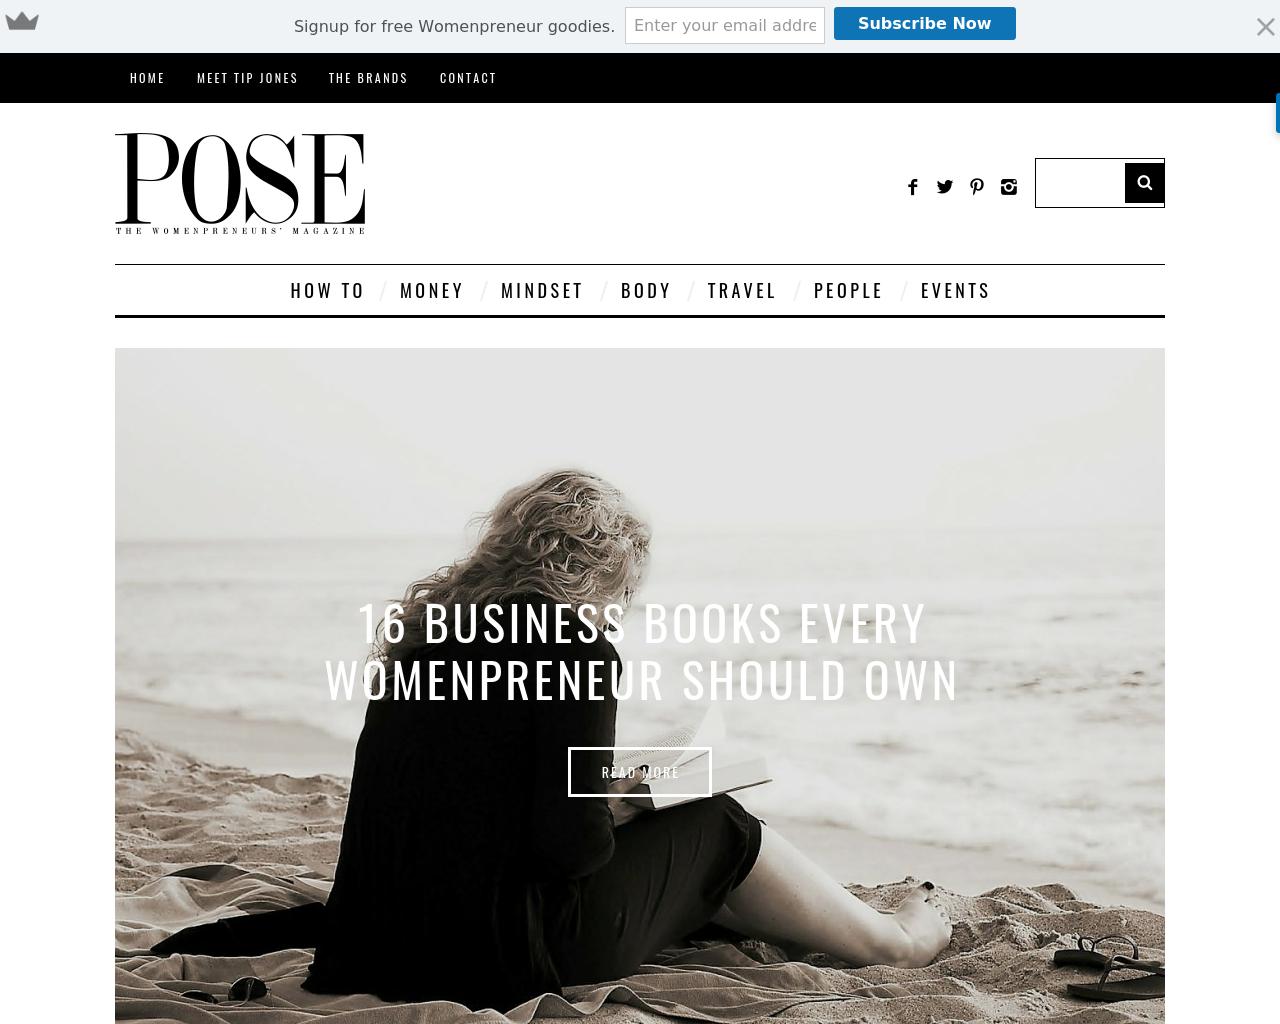 POSE-Advertising-Reviews-Pricing